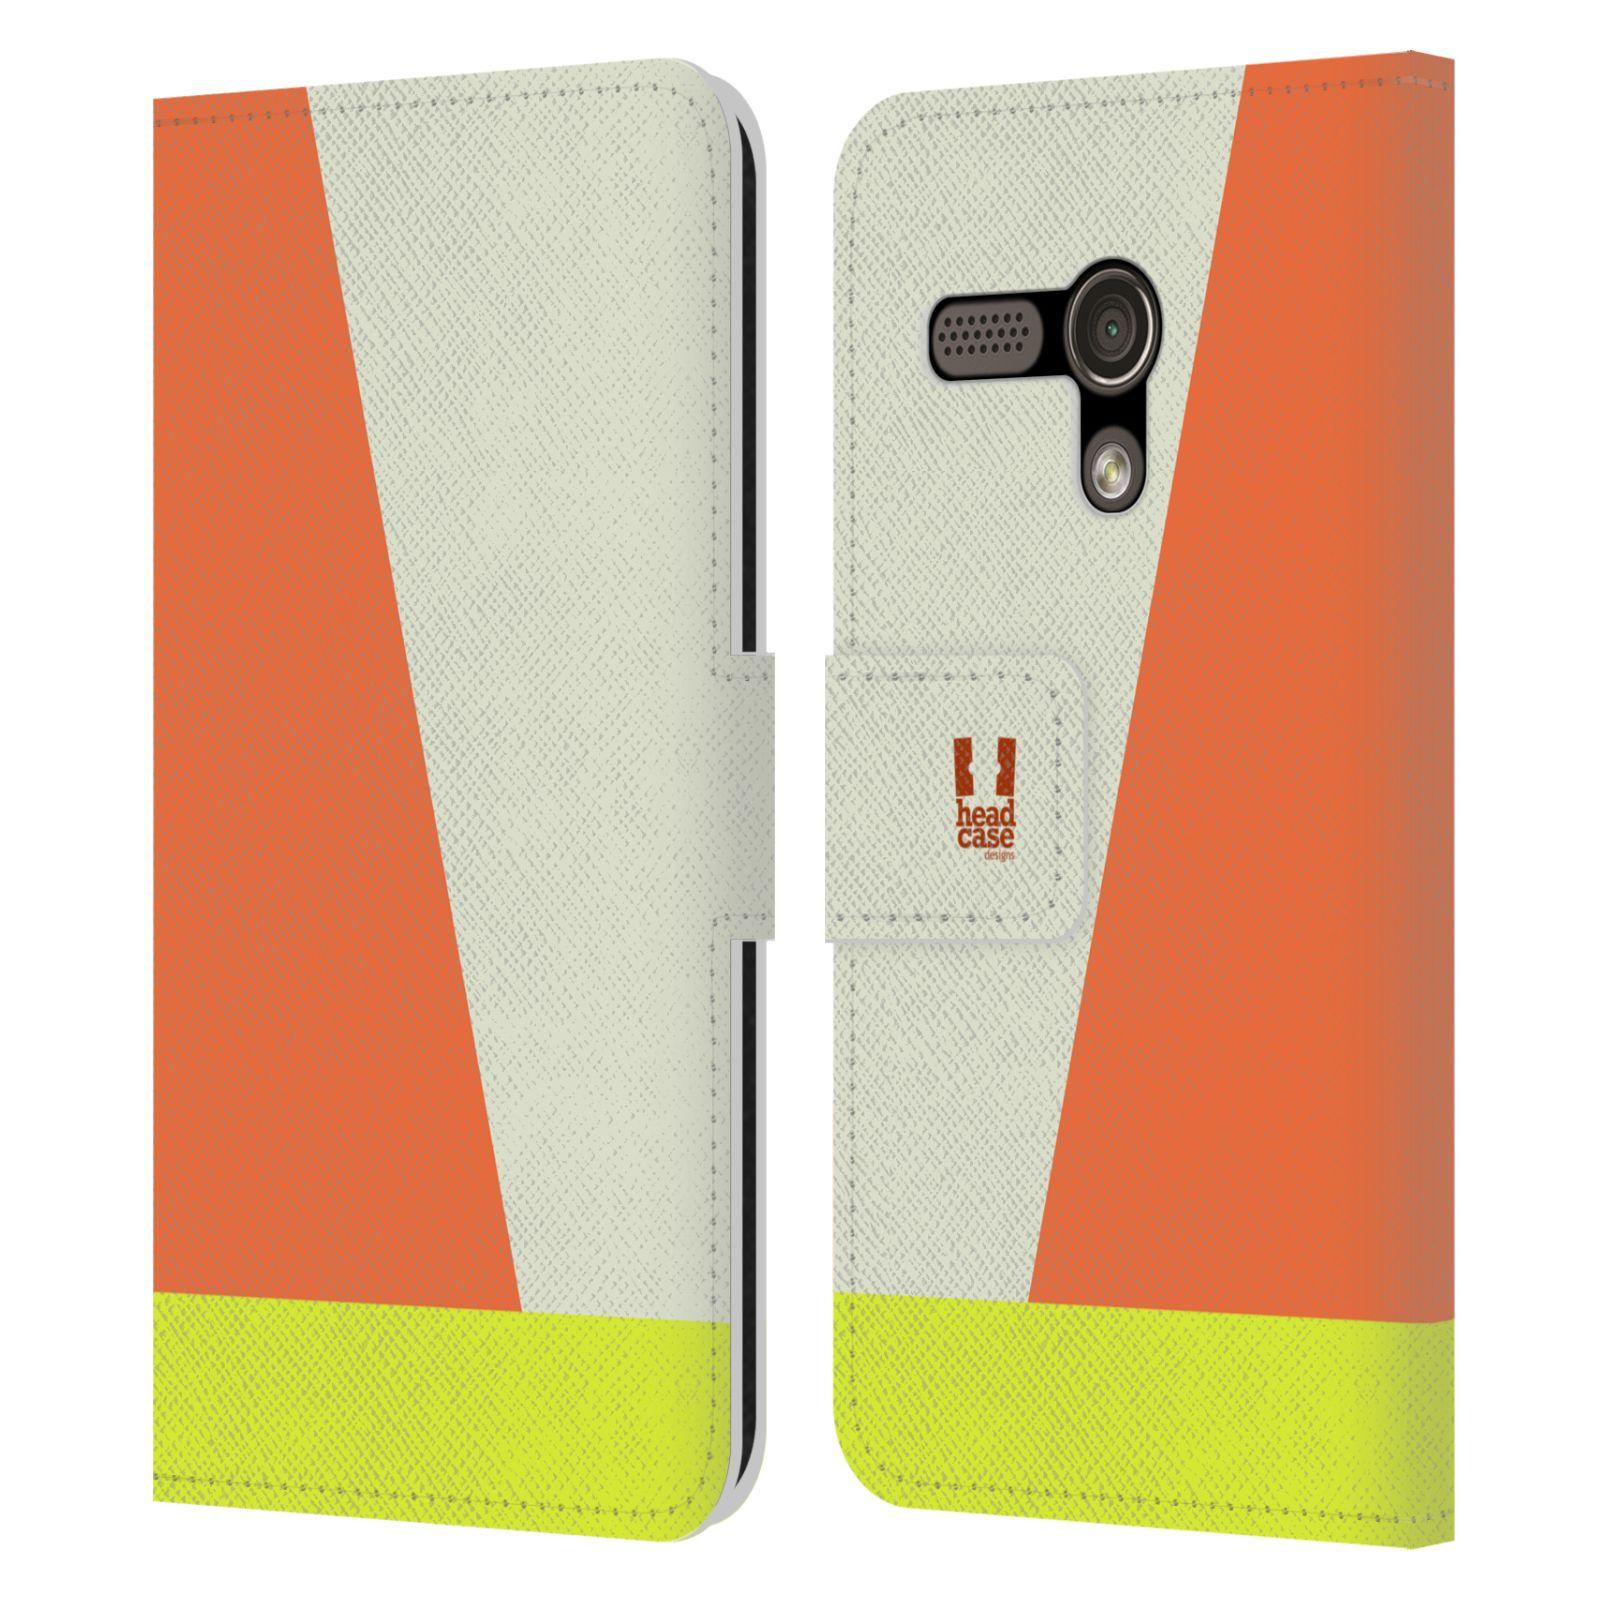 HEAD CASE Flipové pouzdro pro mobil Motorola MOTO G barevné tvary slonová kost